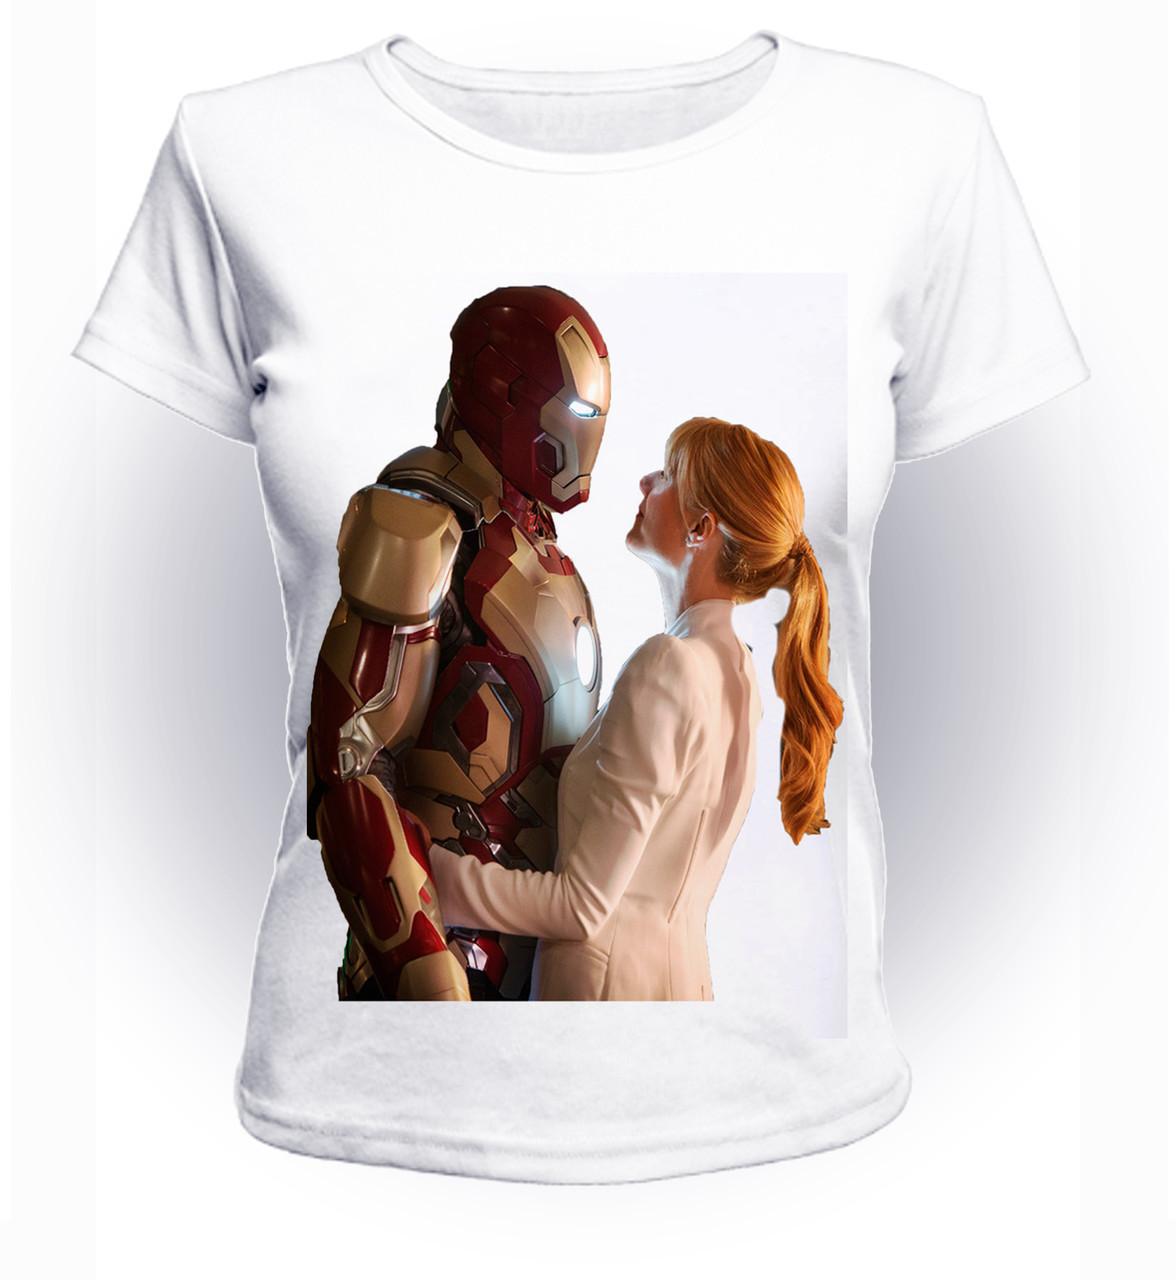 Футболка женская GeekLand Железный Человек Iron Man Пеппер Поттс art IM.01.071